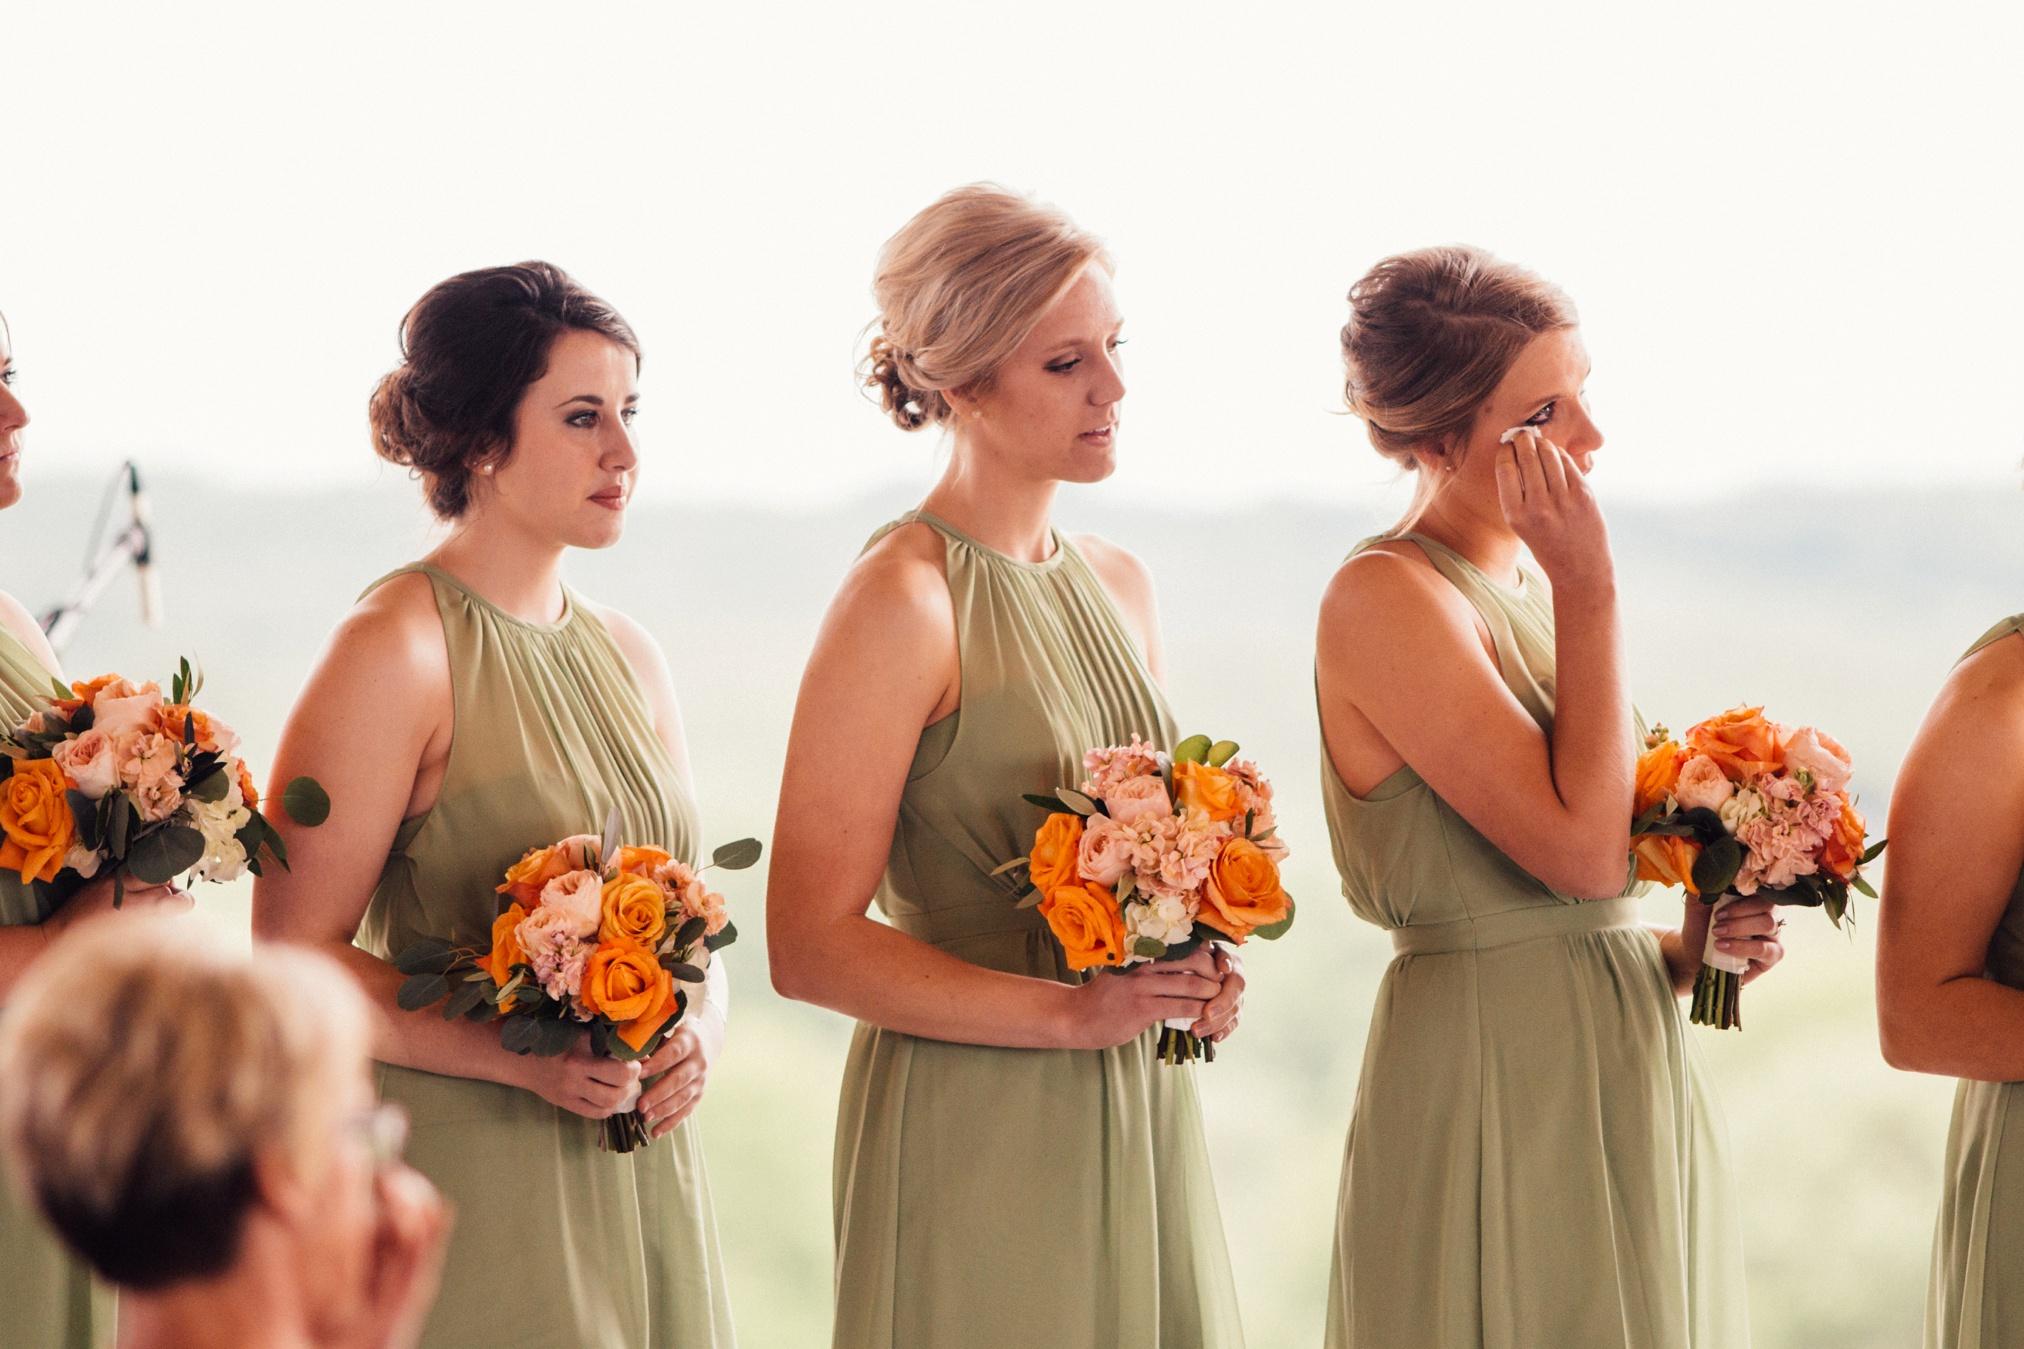 schmid_wedding-409.jpg